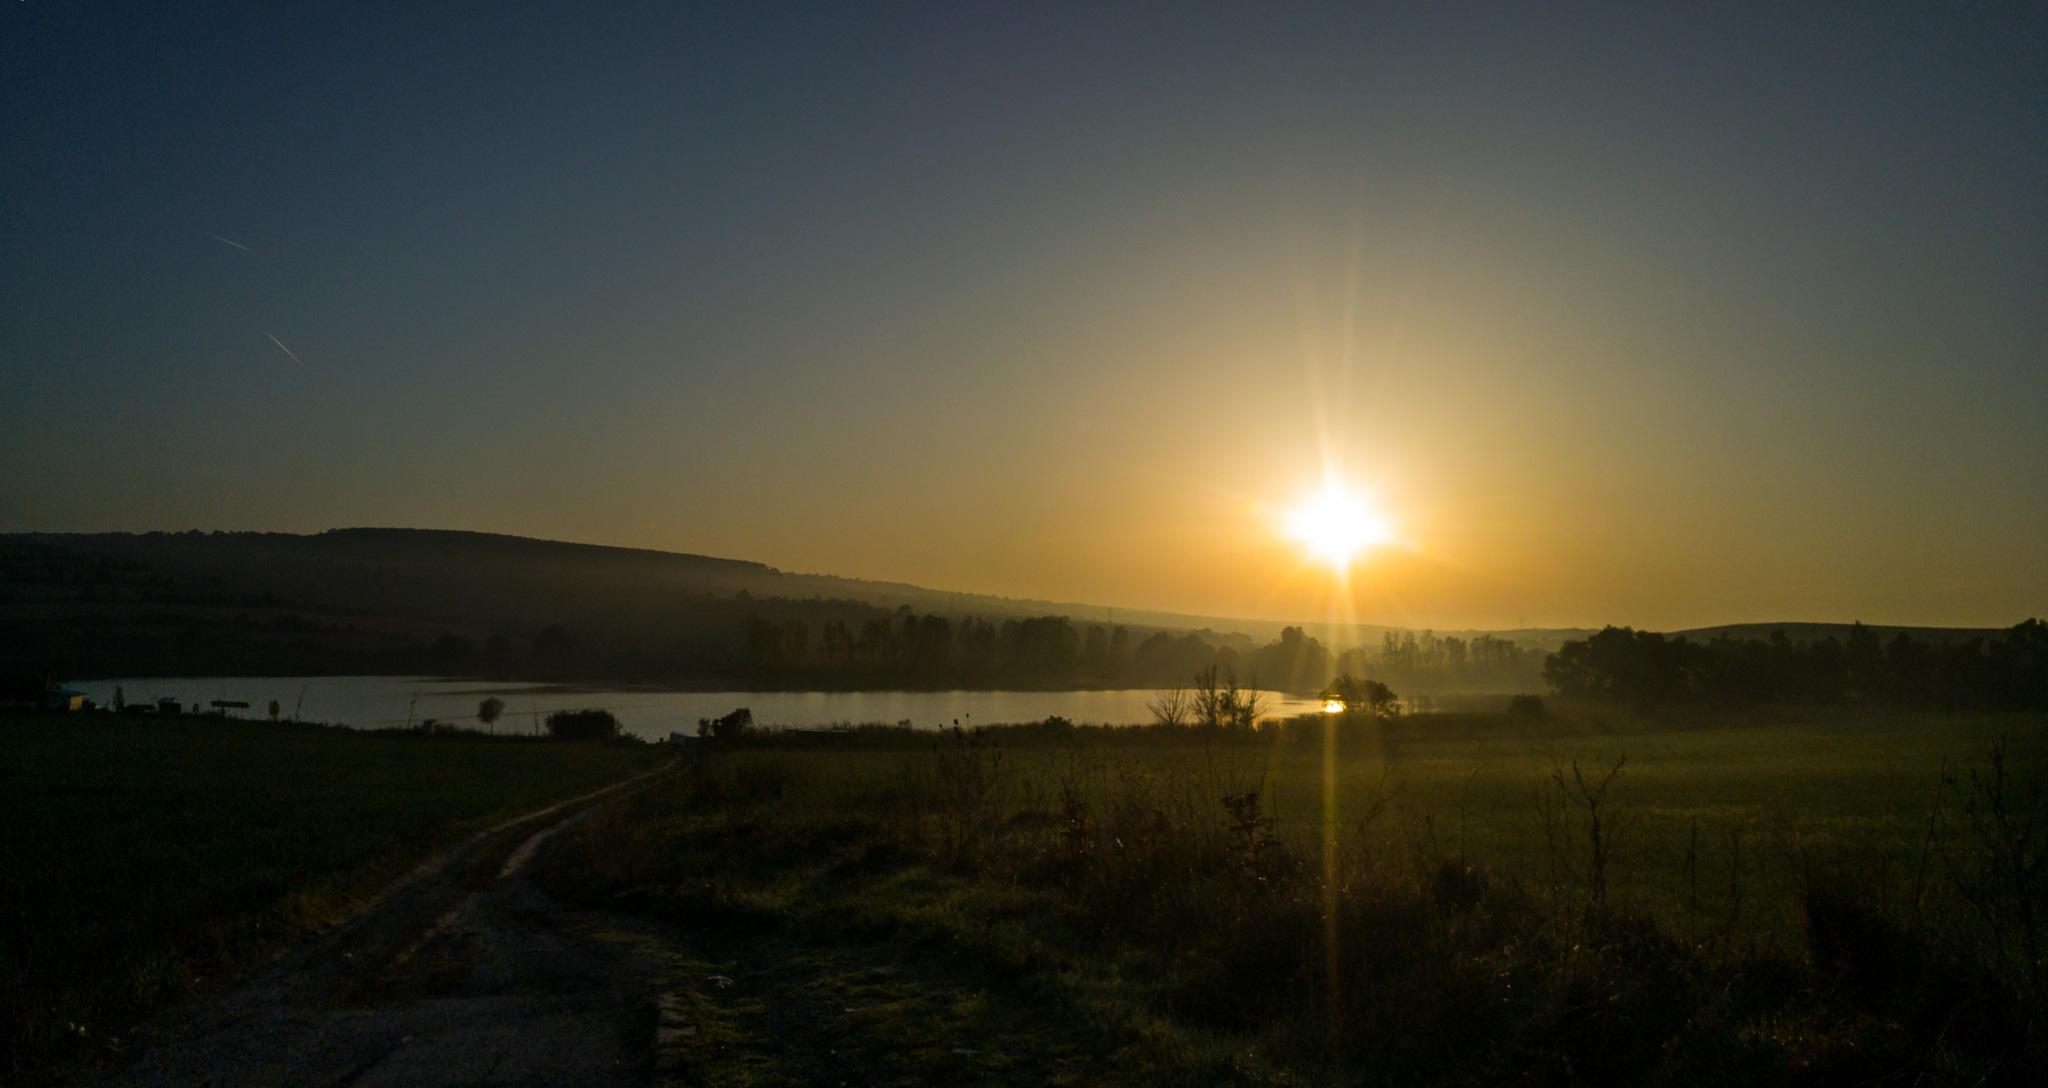 Sunrise by Tsvetan Ganev-CECLII